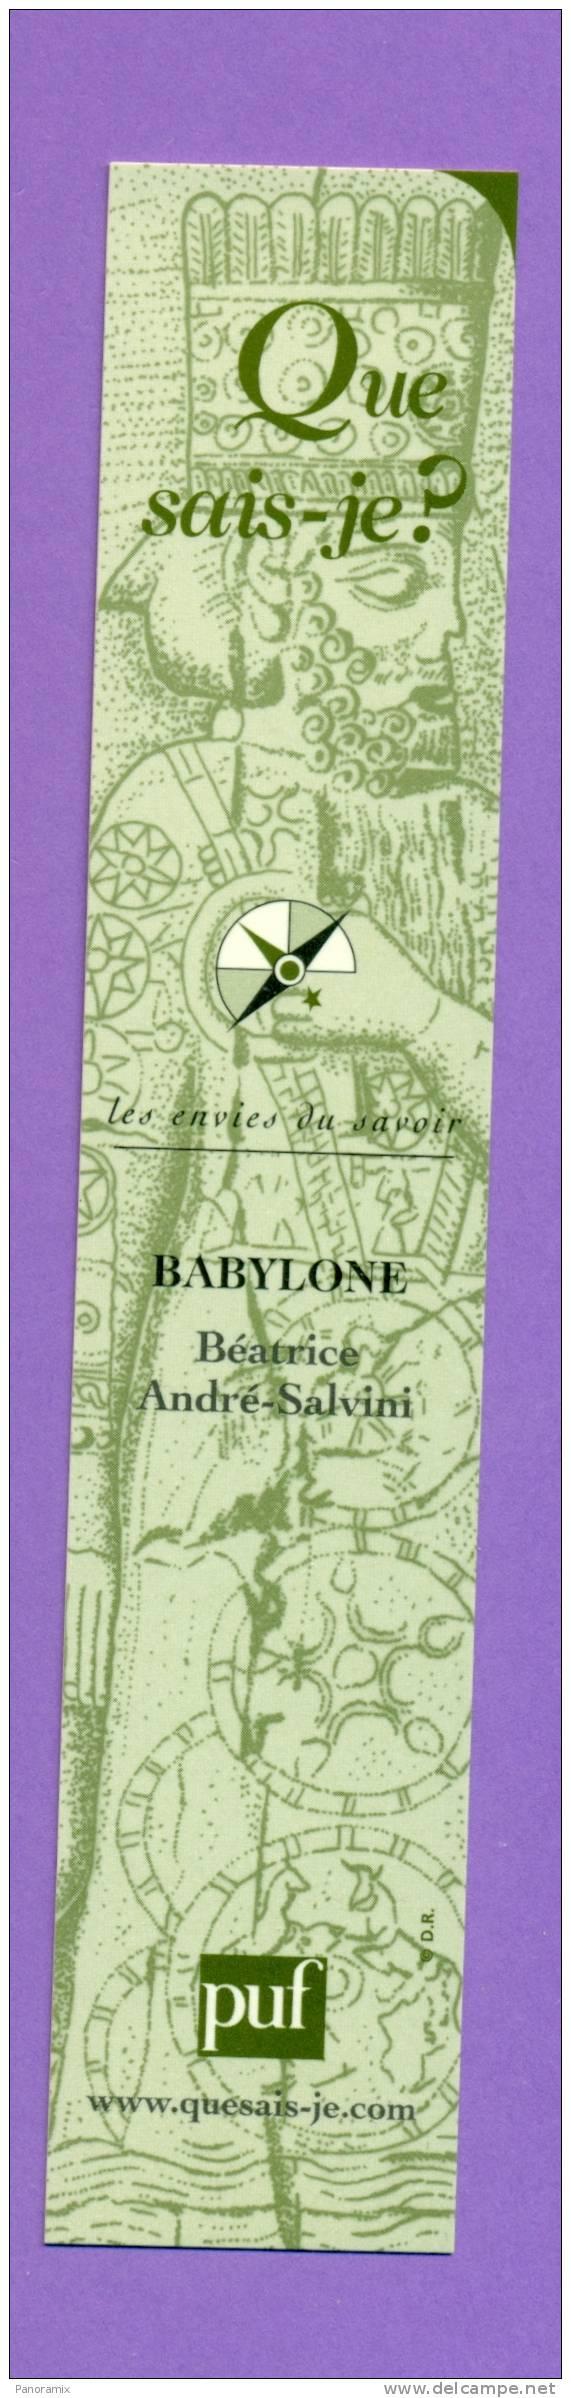 "Puf   Que  Suis - Je   ""  Babylone  ""   4 X 20 Cm - Marque-Pages"